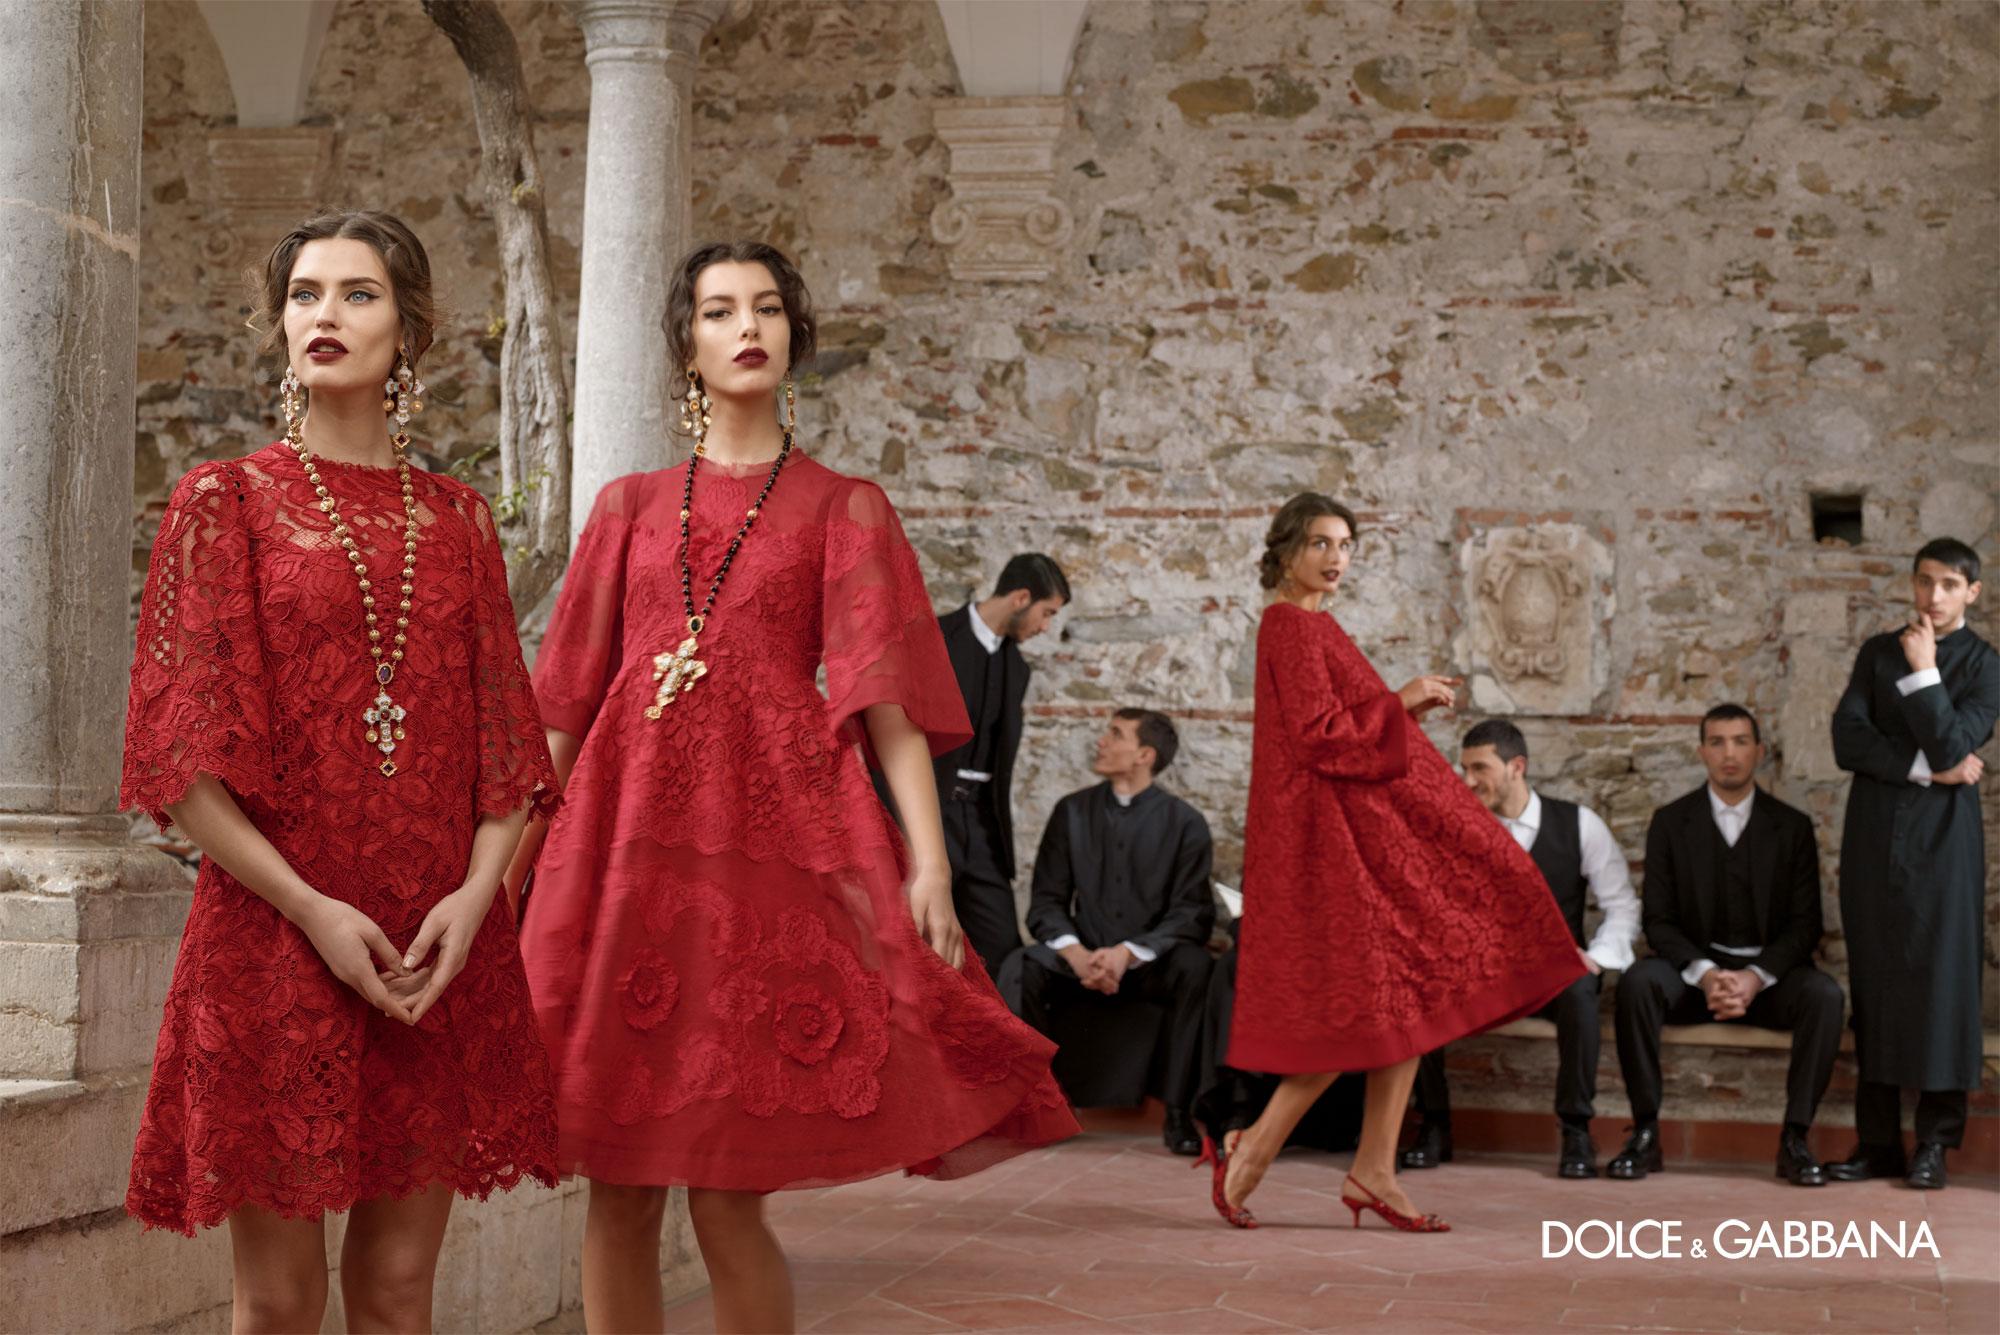 dolce-and-gabbana-fw-2014-women-adv-campaign- 8eb666853d1